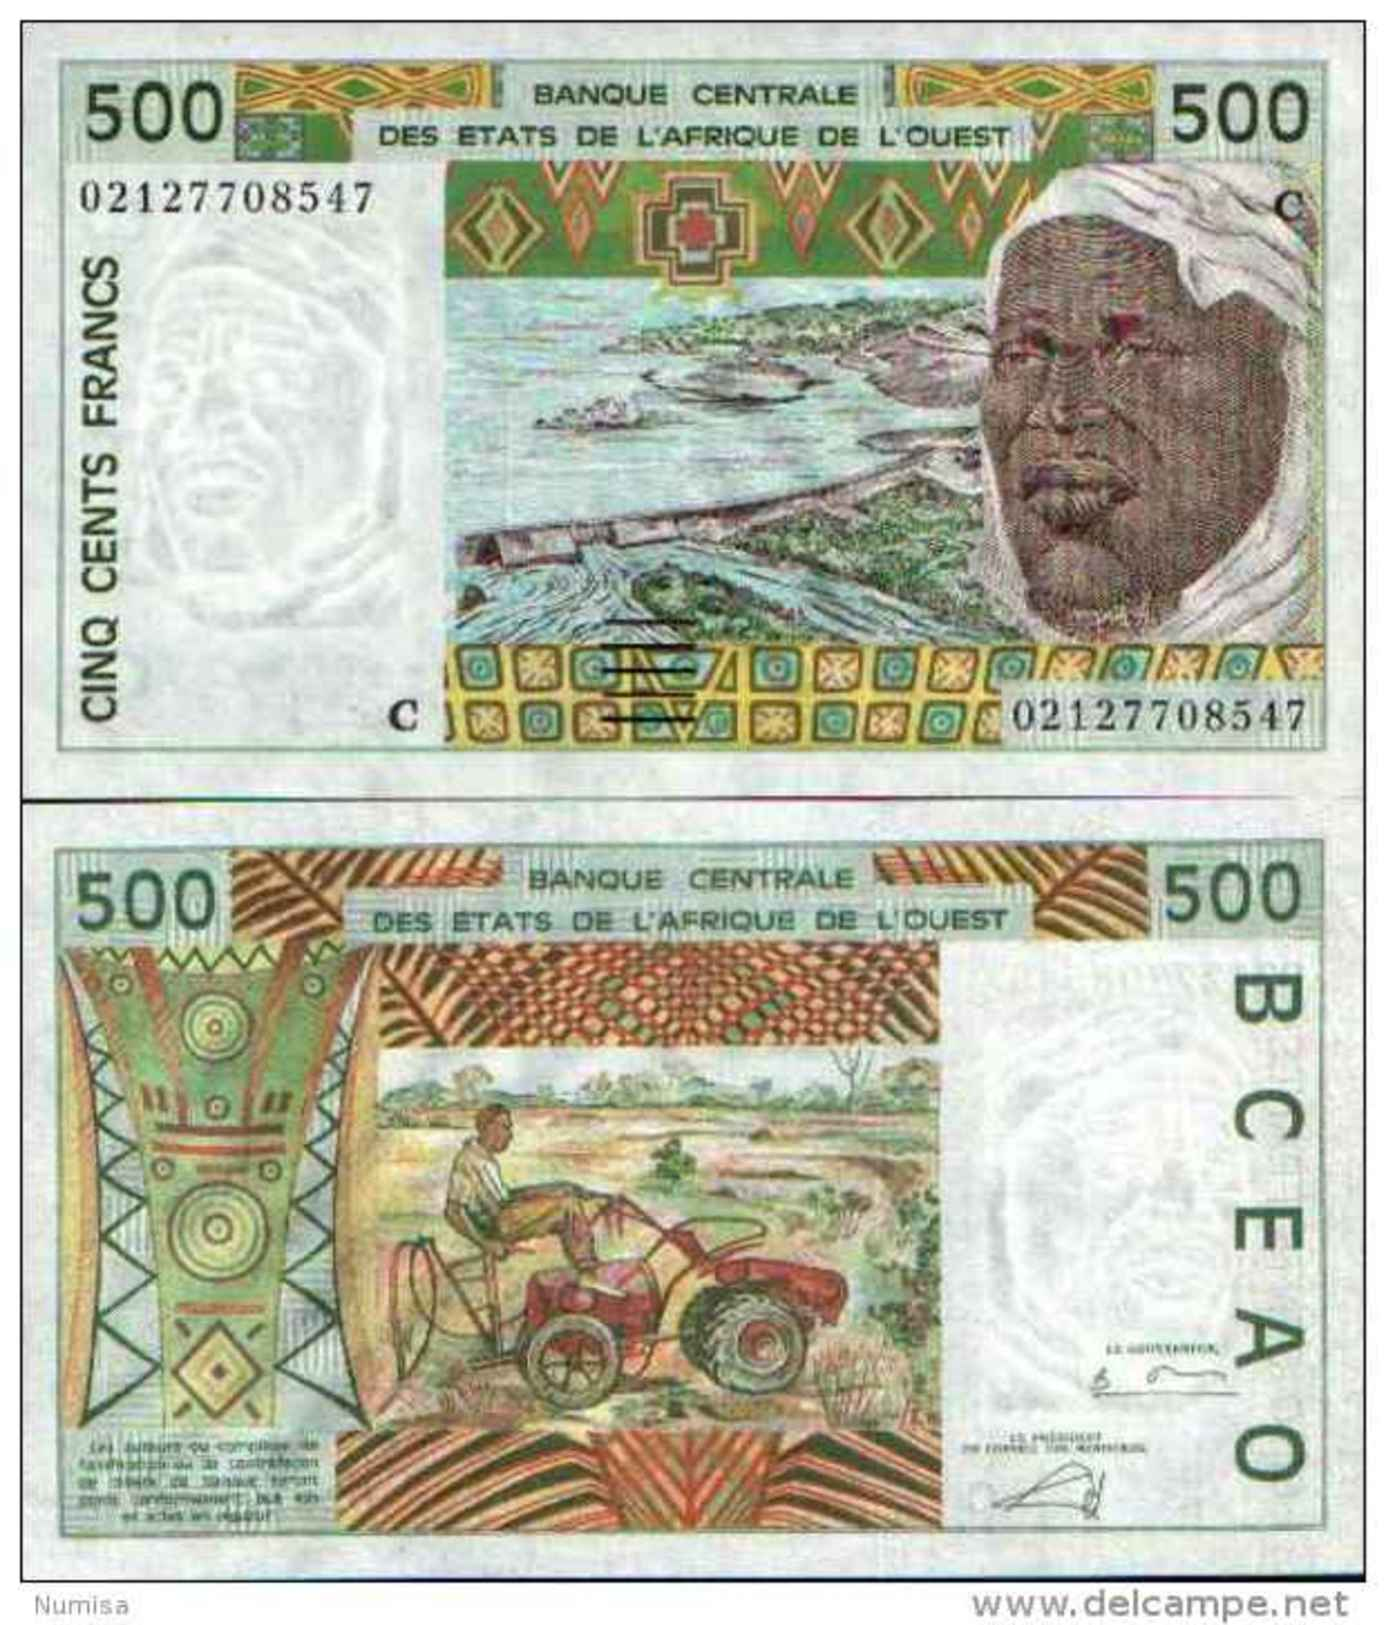 Burkina Faso 500 FRANCS (2002) Pick 310Cm - Burkina Faso